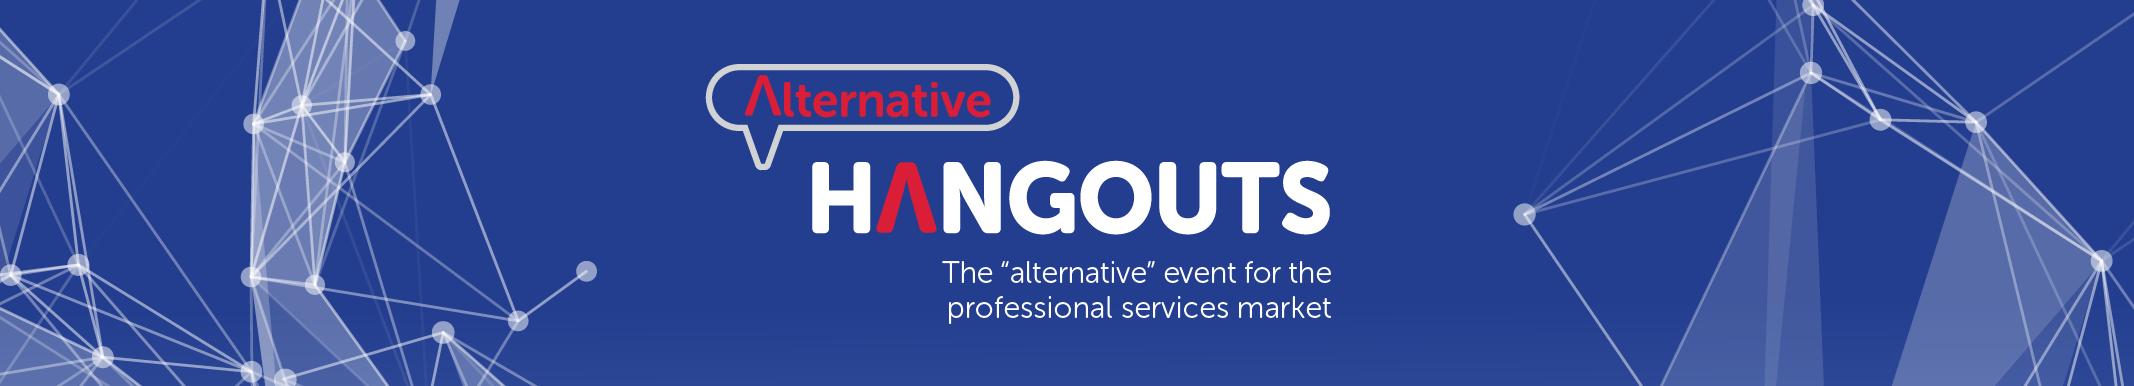 Alternative-Hangouts-Banner